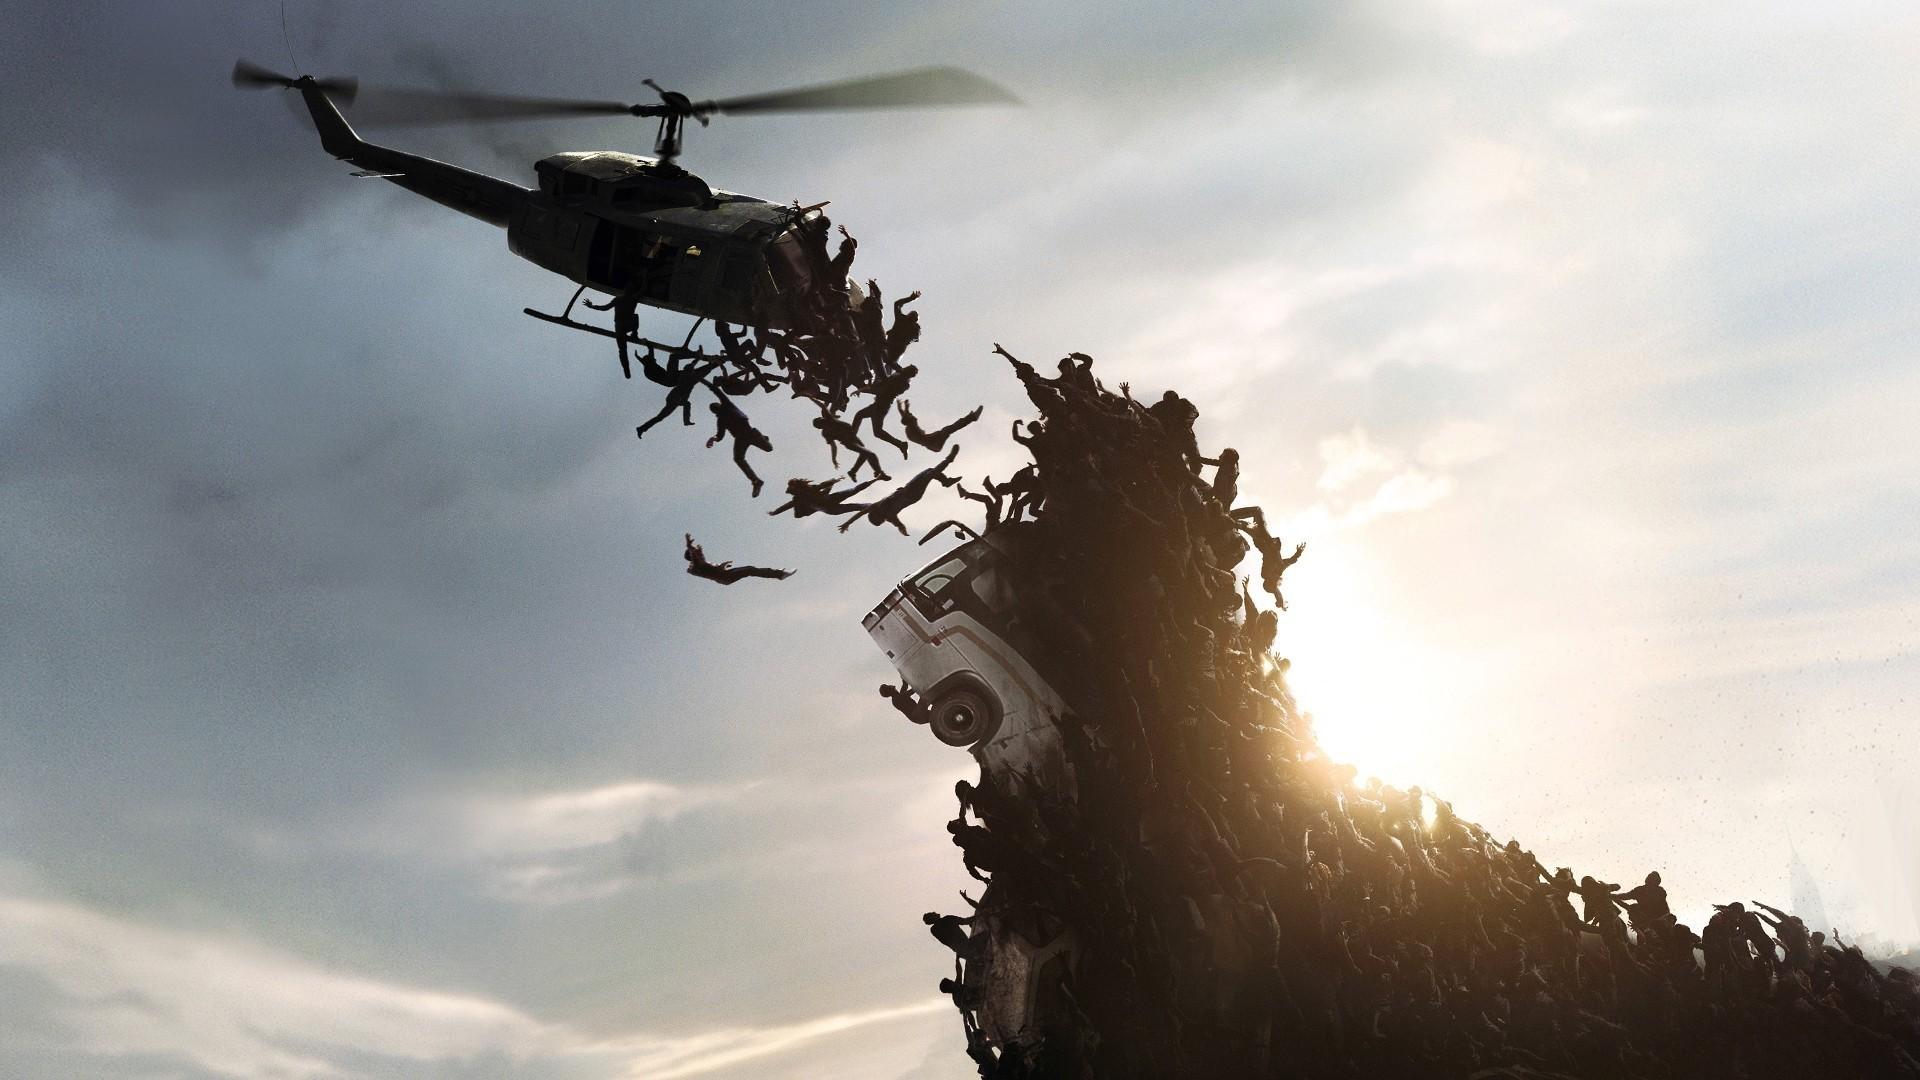 World war z falling skies zombie apocalypse wallpaper .